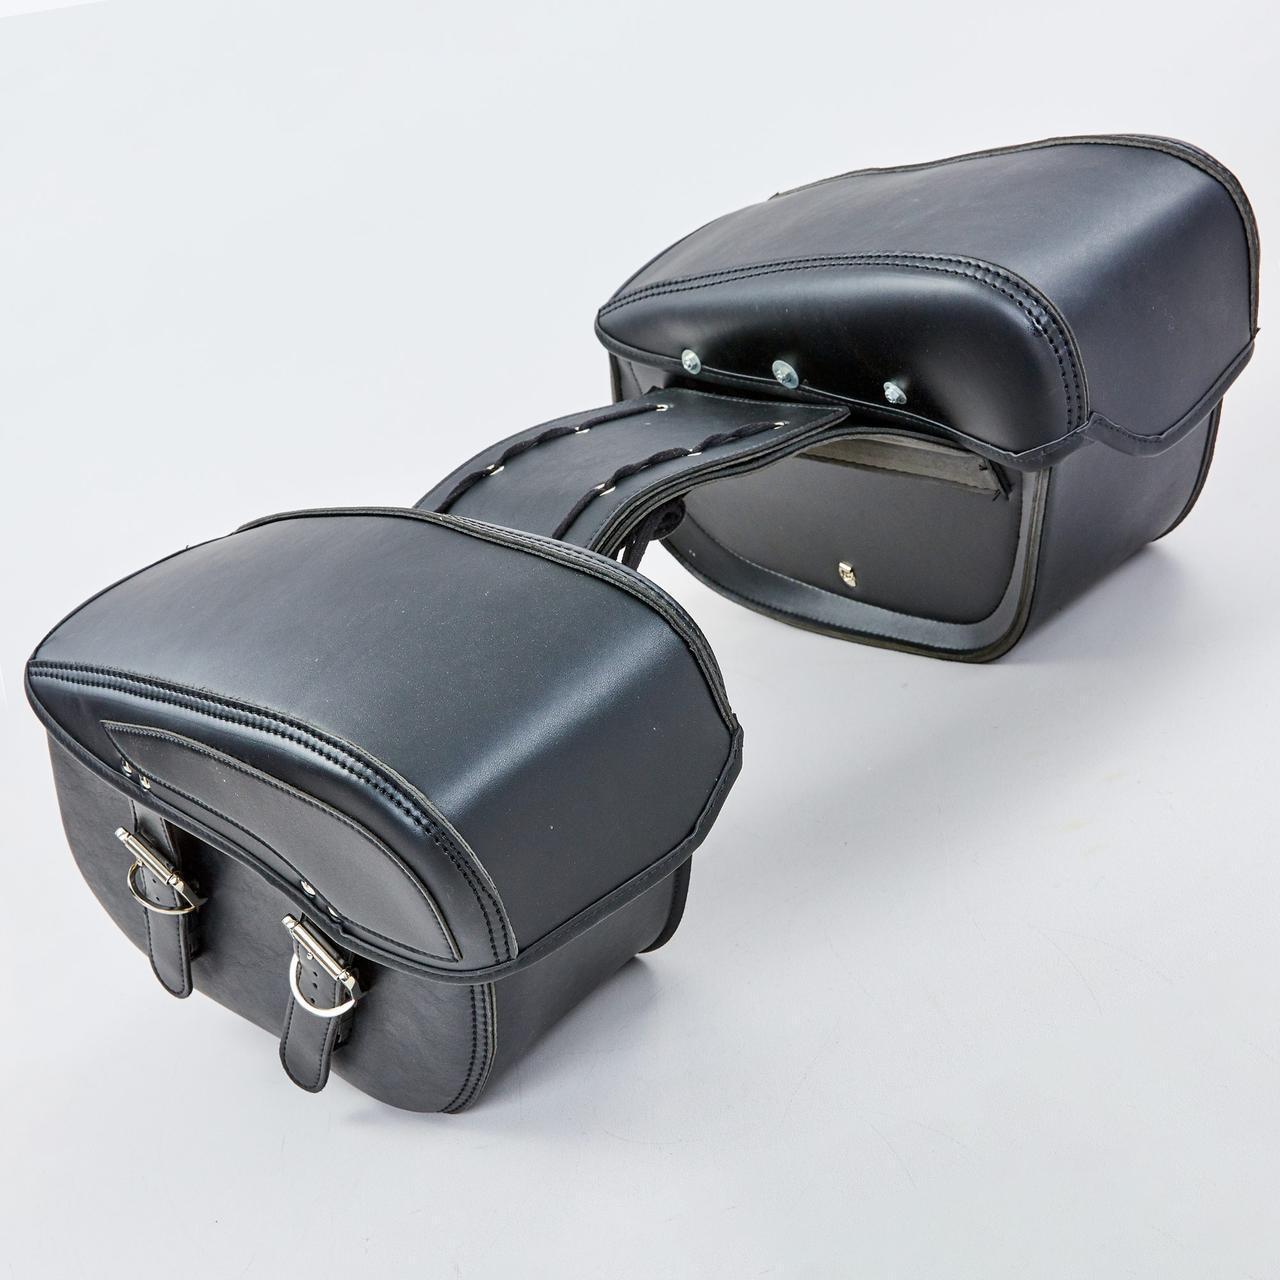 Мотосумка (2 кофра) H01-2 (PVC, р-р 49x31x15см, черный)